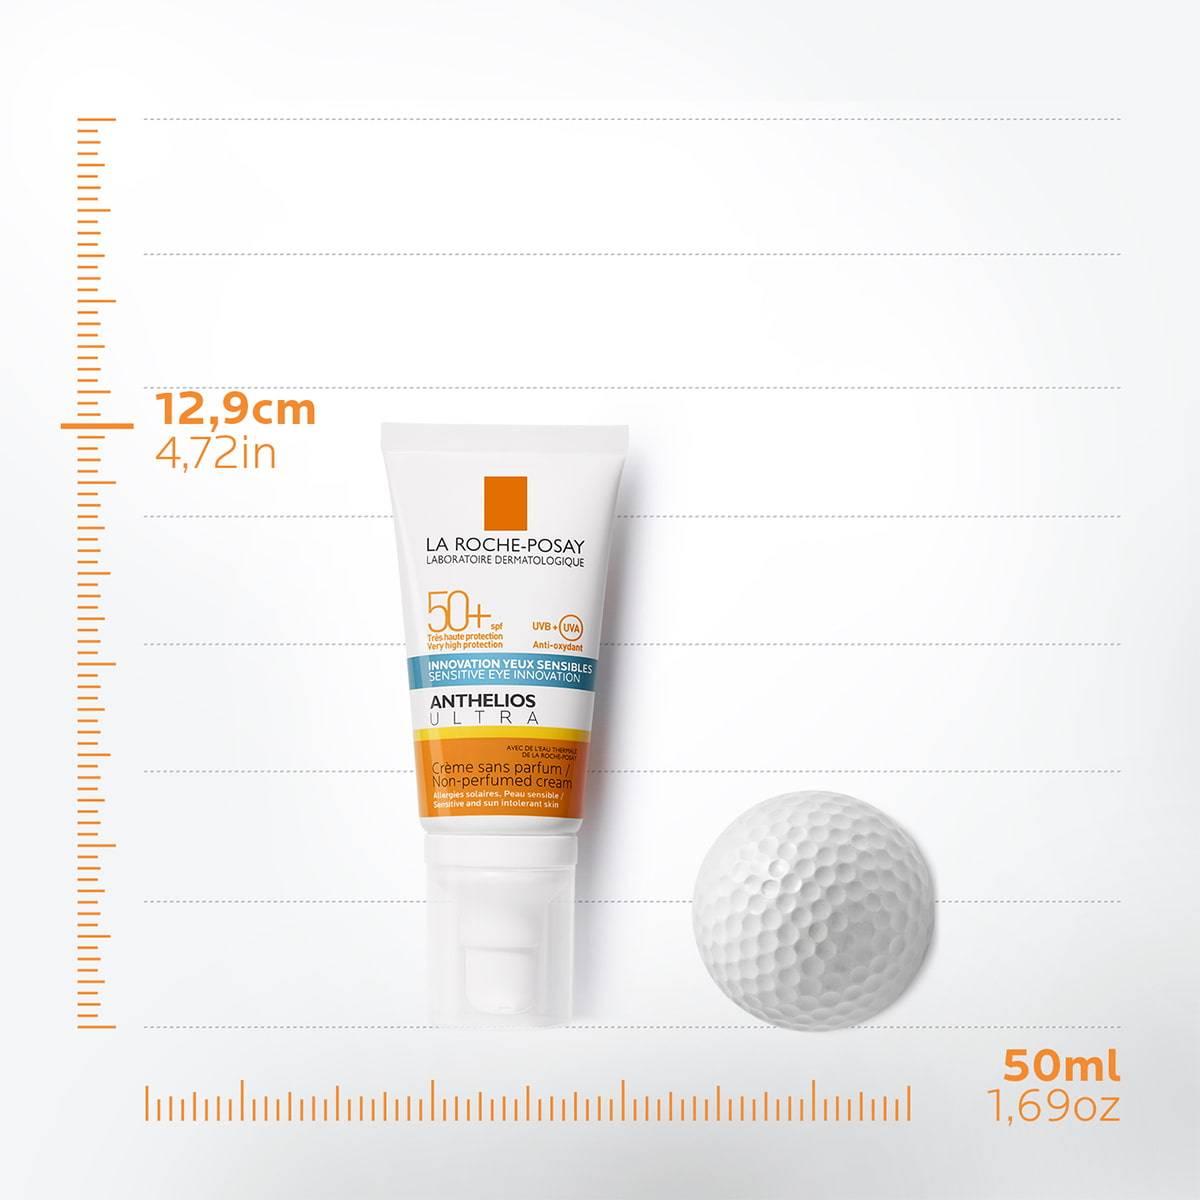 La Roche Posay Produktsida Sol Anthelios Ultra Face Spf50 50ml